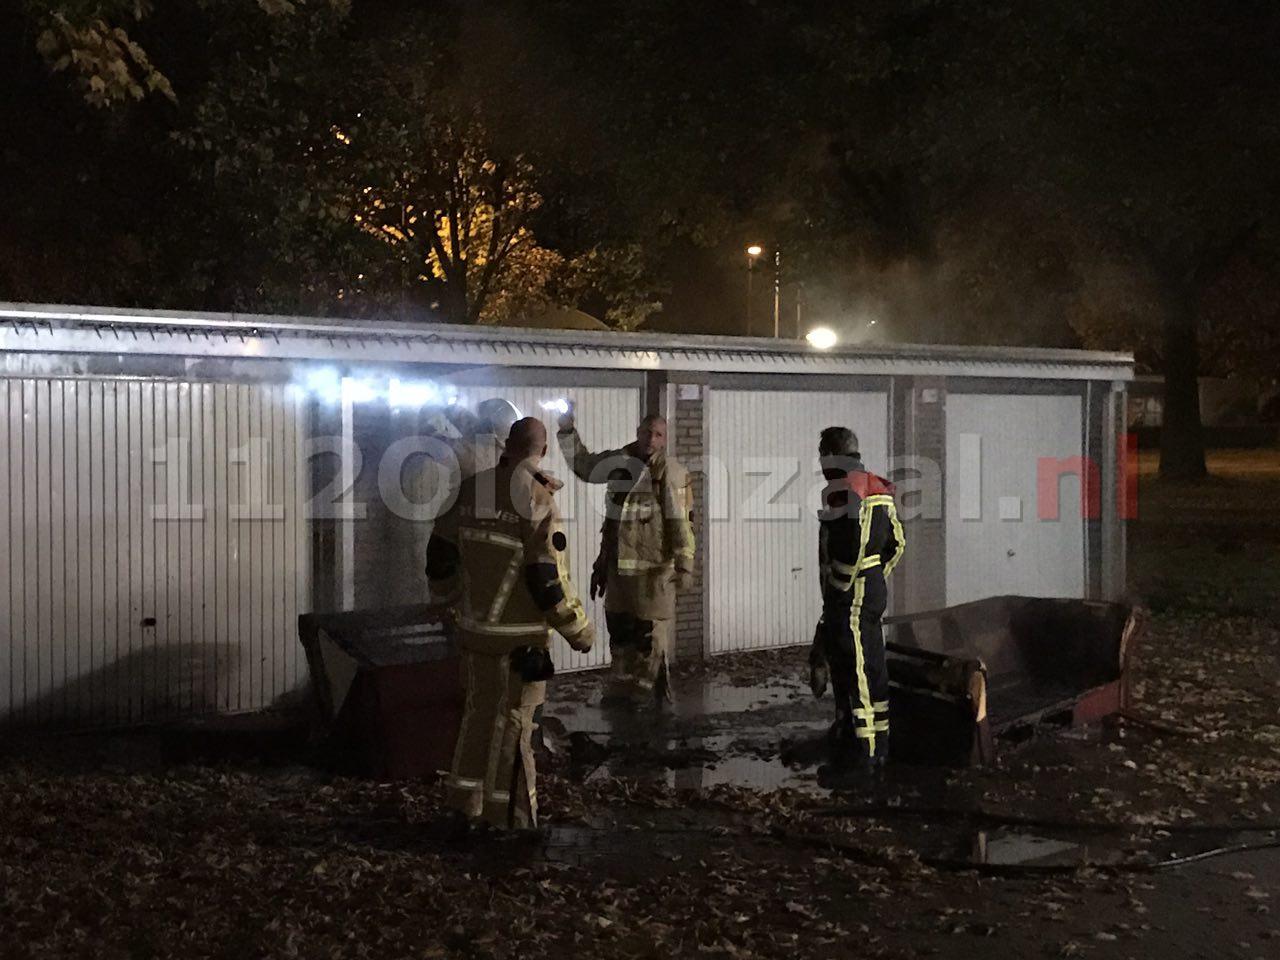 VIDEO: Brandend bankstel Enschede beschadigt garageboxen